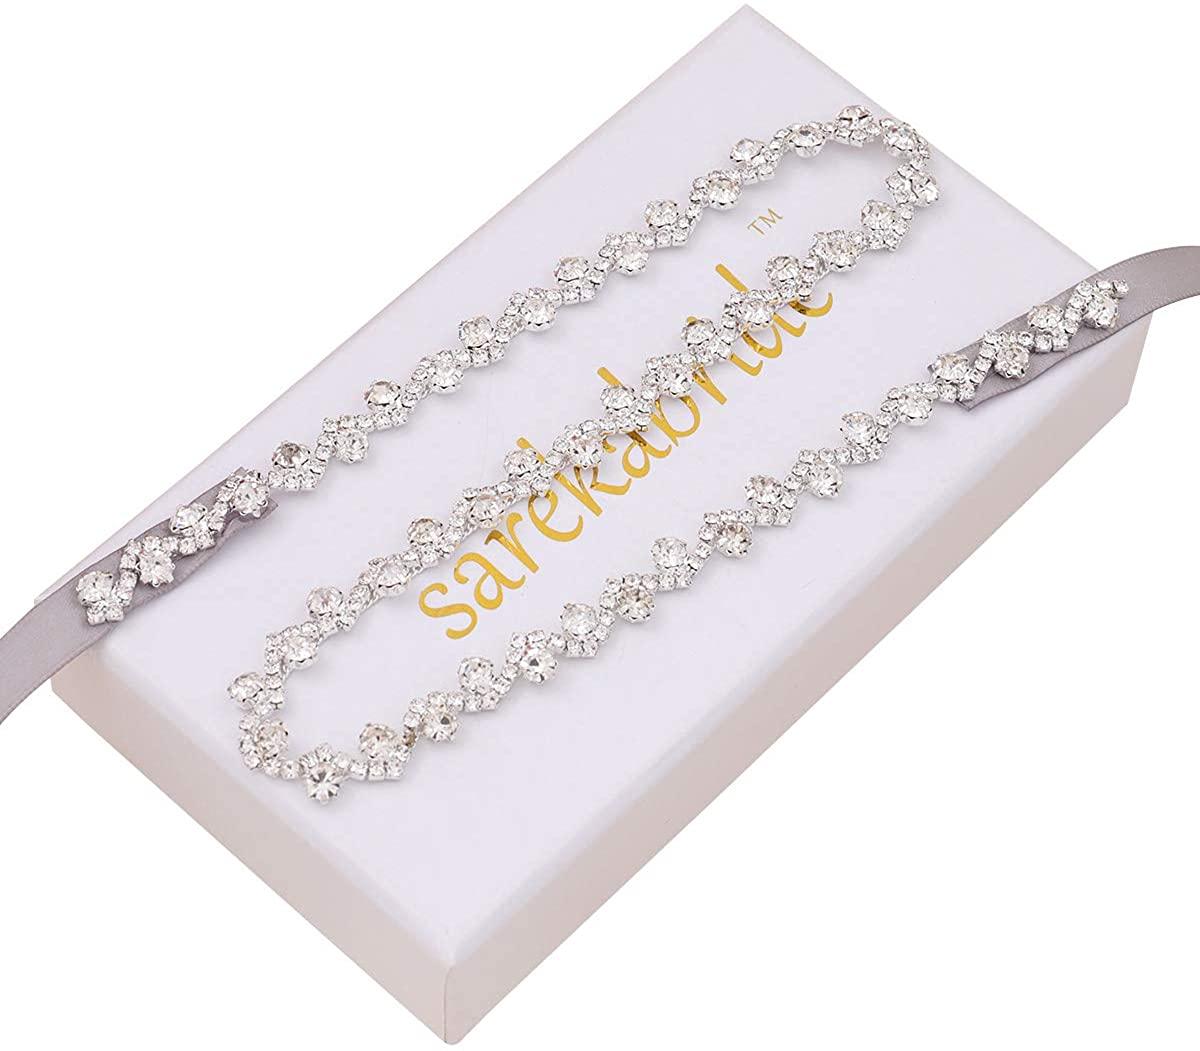 Sarekabride Bridal Belt Rhinestone Wedding Bridesmaid Belt Sashes with Ribbon for Bridal Gown Dress